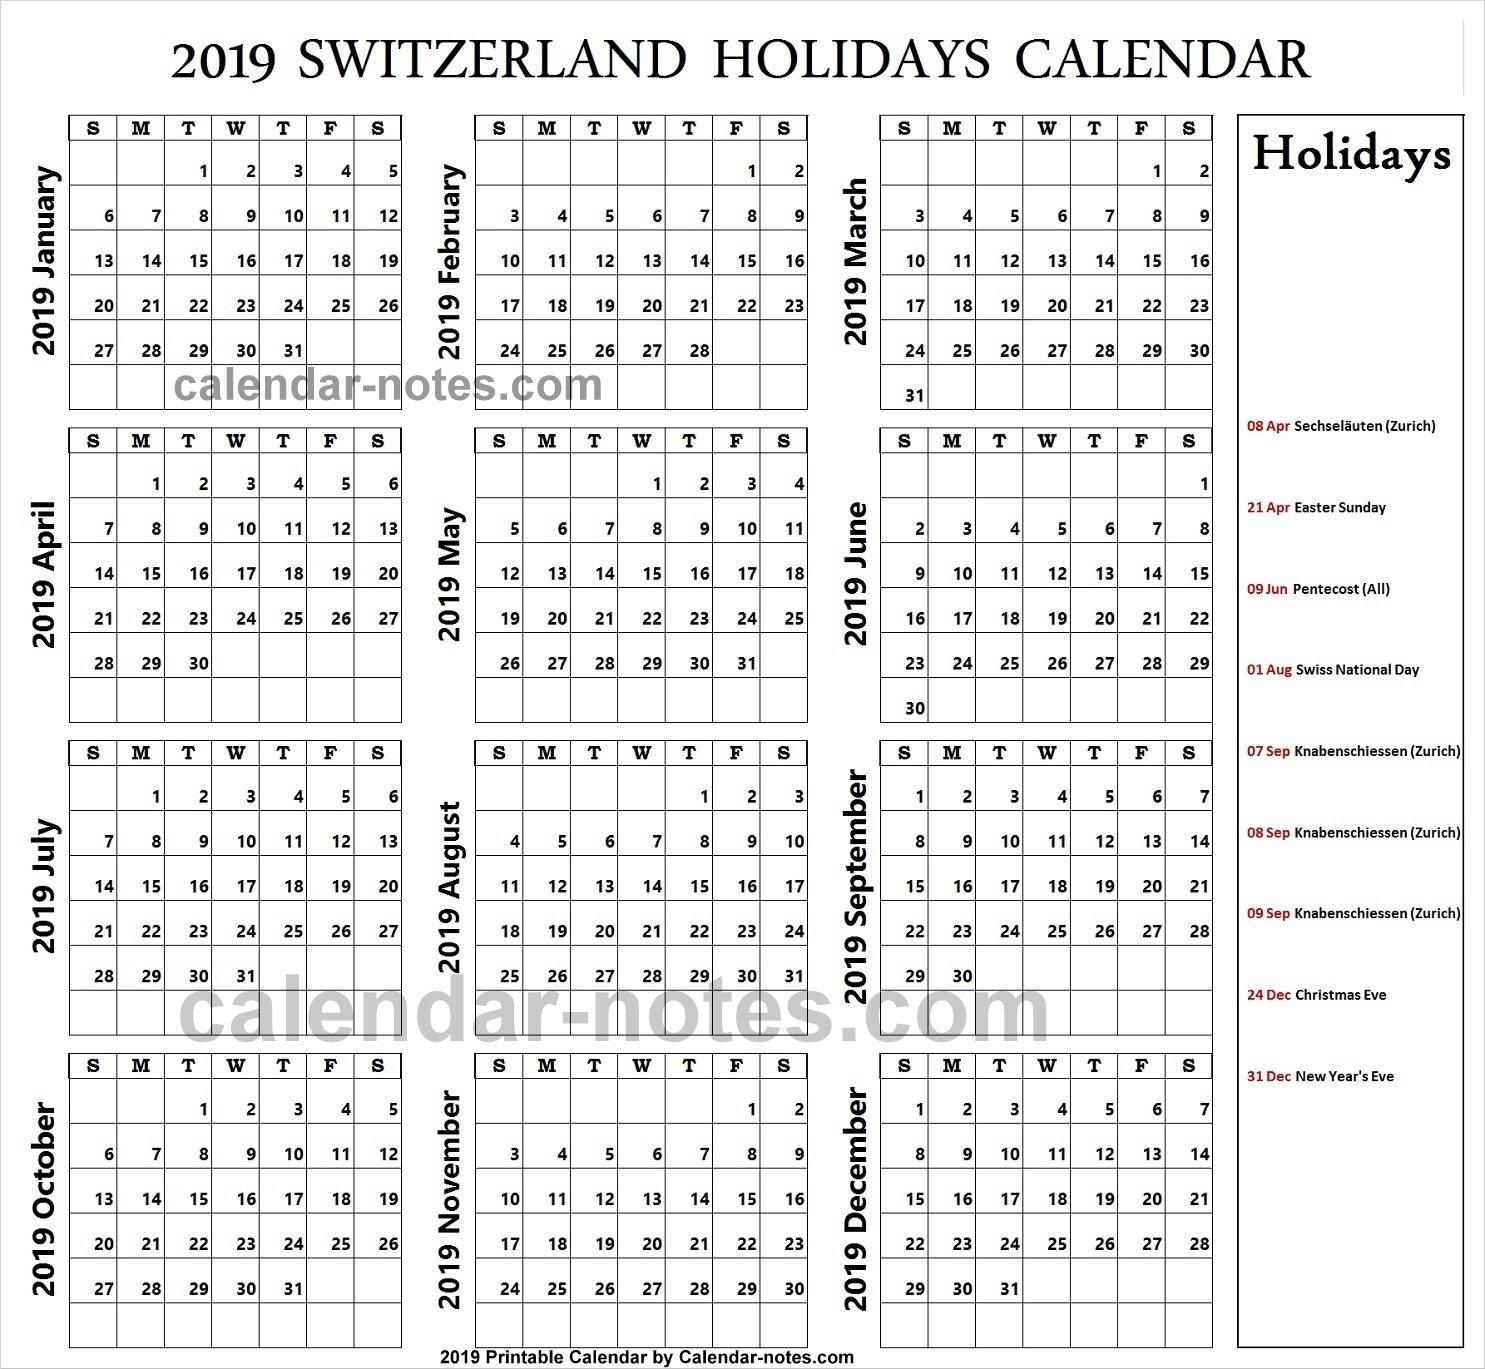 Holidays Calendar 2019 Zurich • Printable Blank Calendar Template Holiday Calendar Zurich 2019